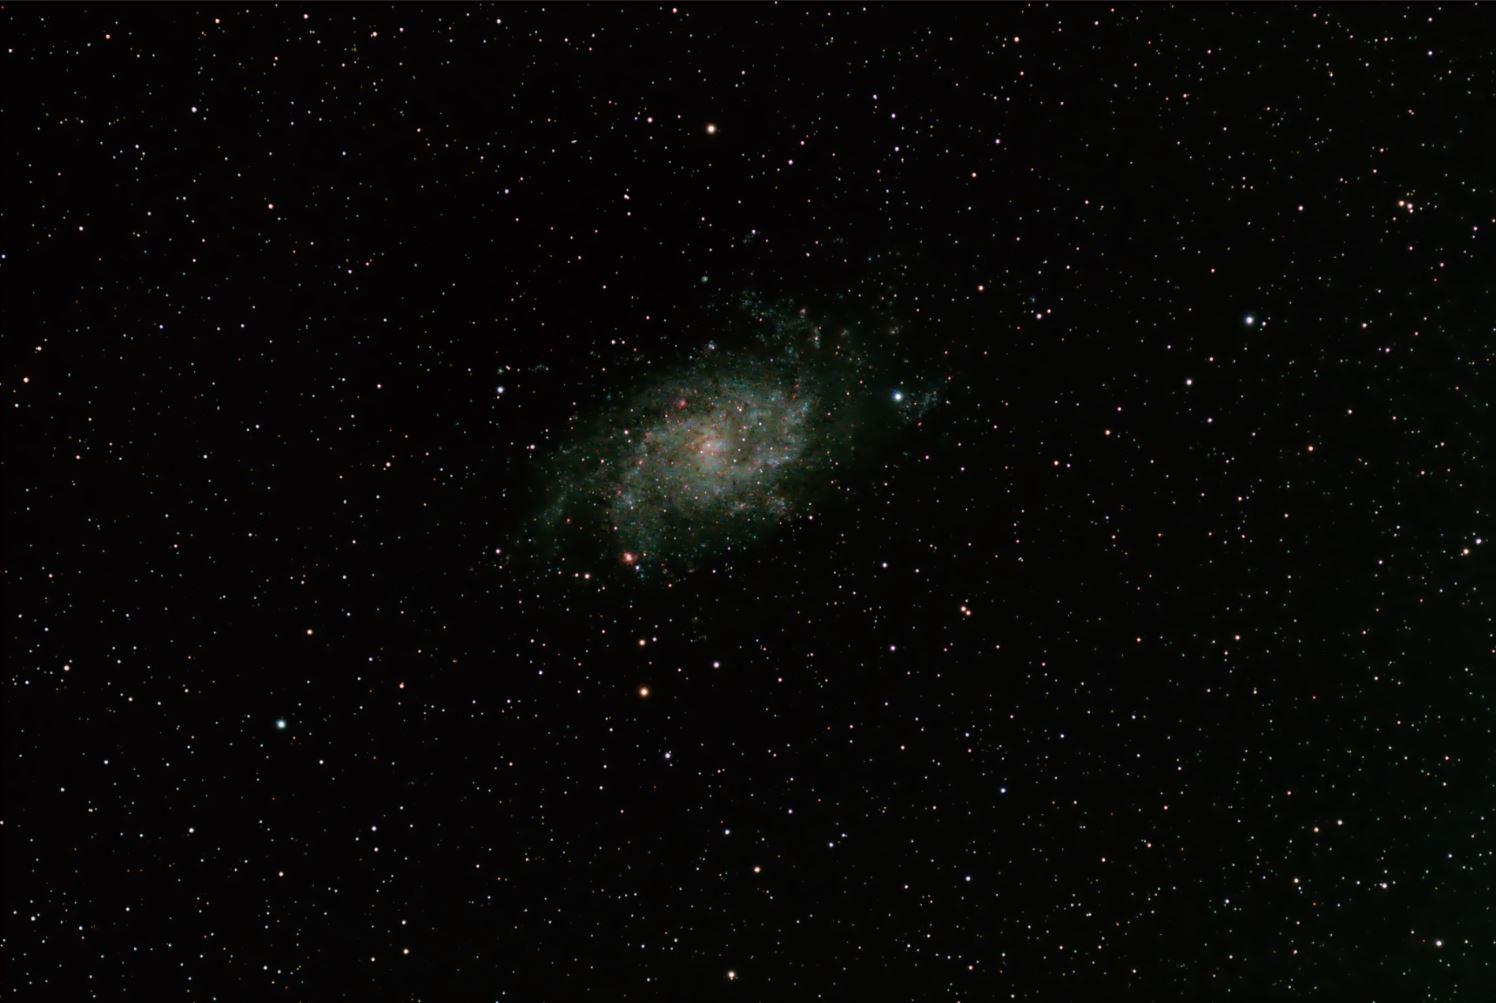 nasa comet tracking - HD1280×829